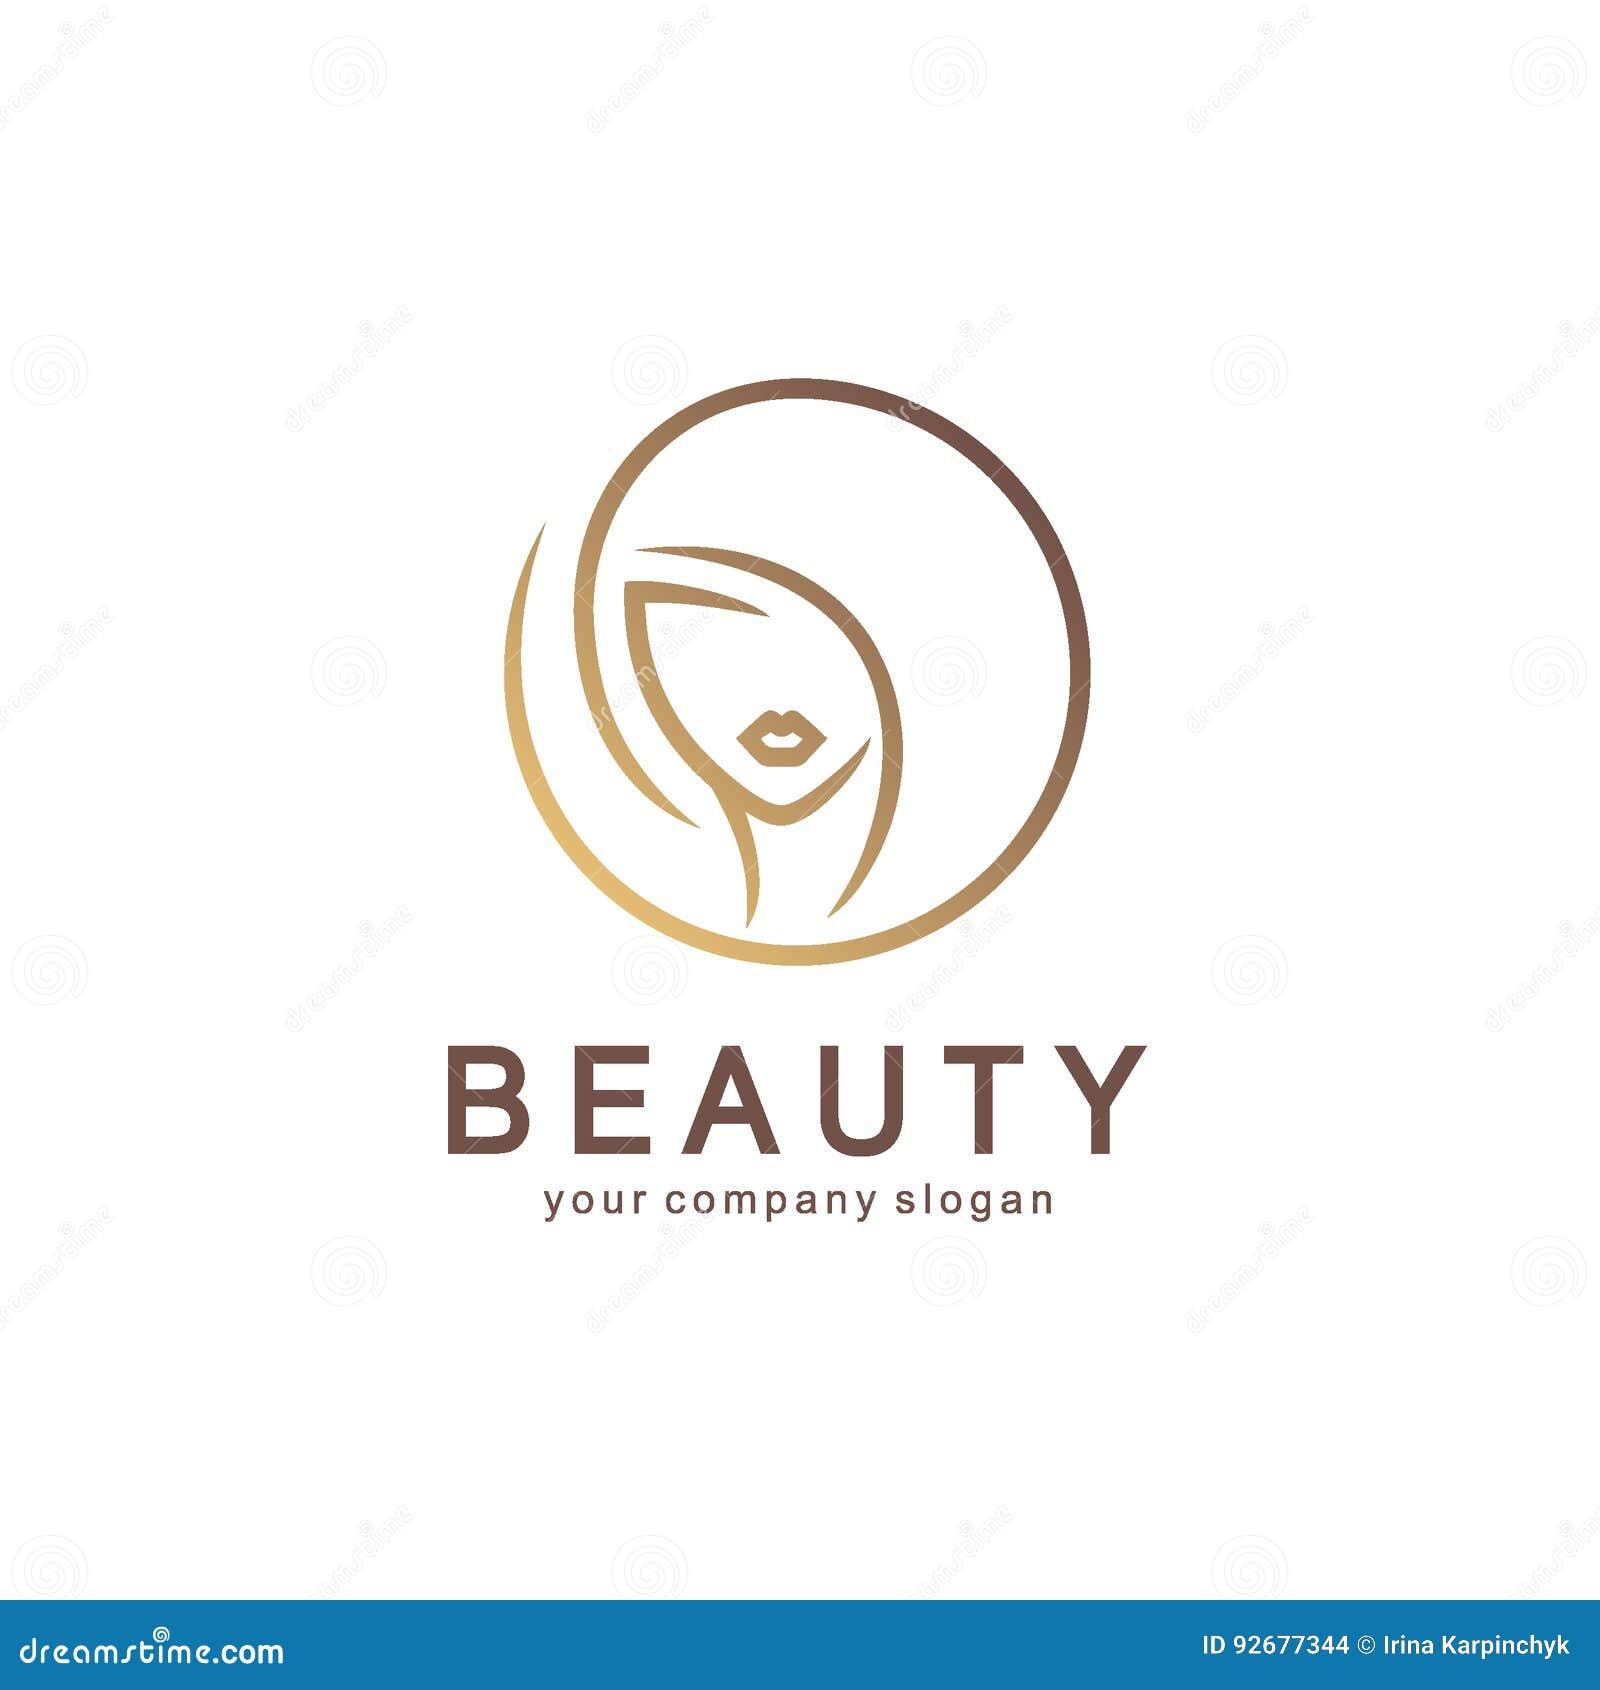 Vektorlogodesign für Schönheitssalon, Friseursalon, Kosmetik